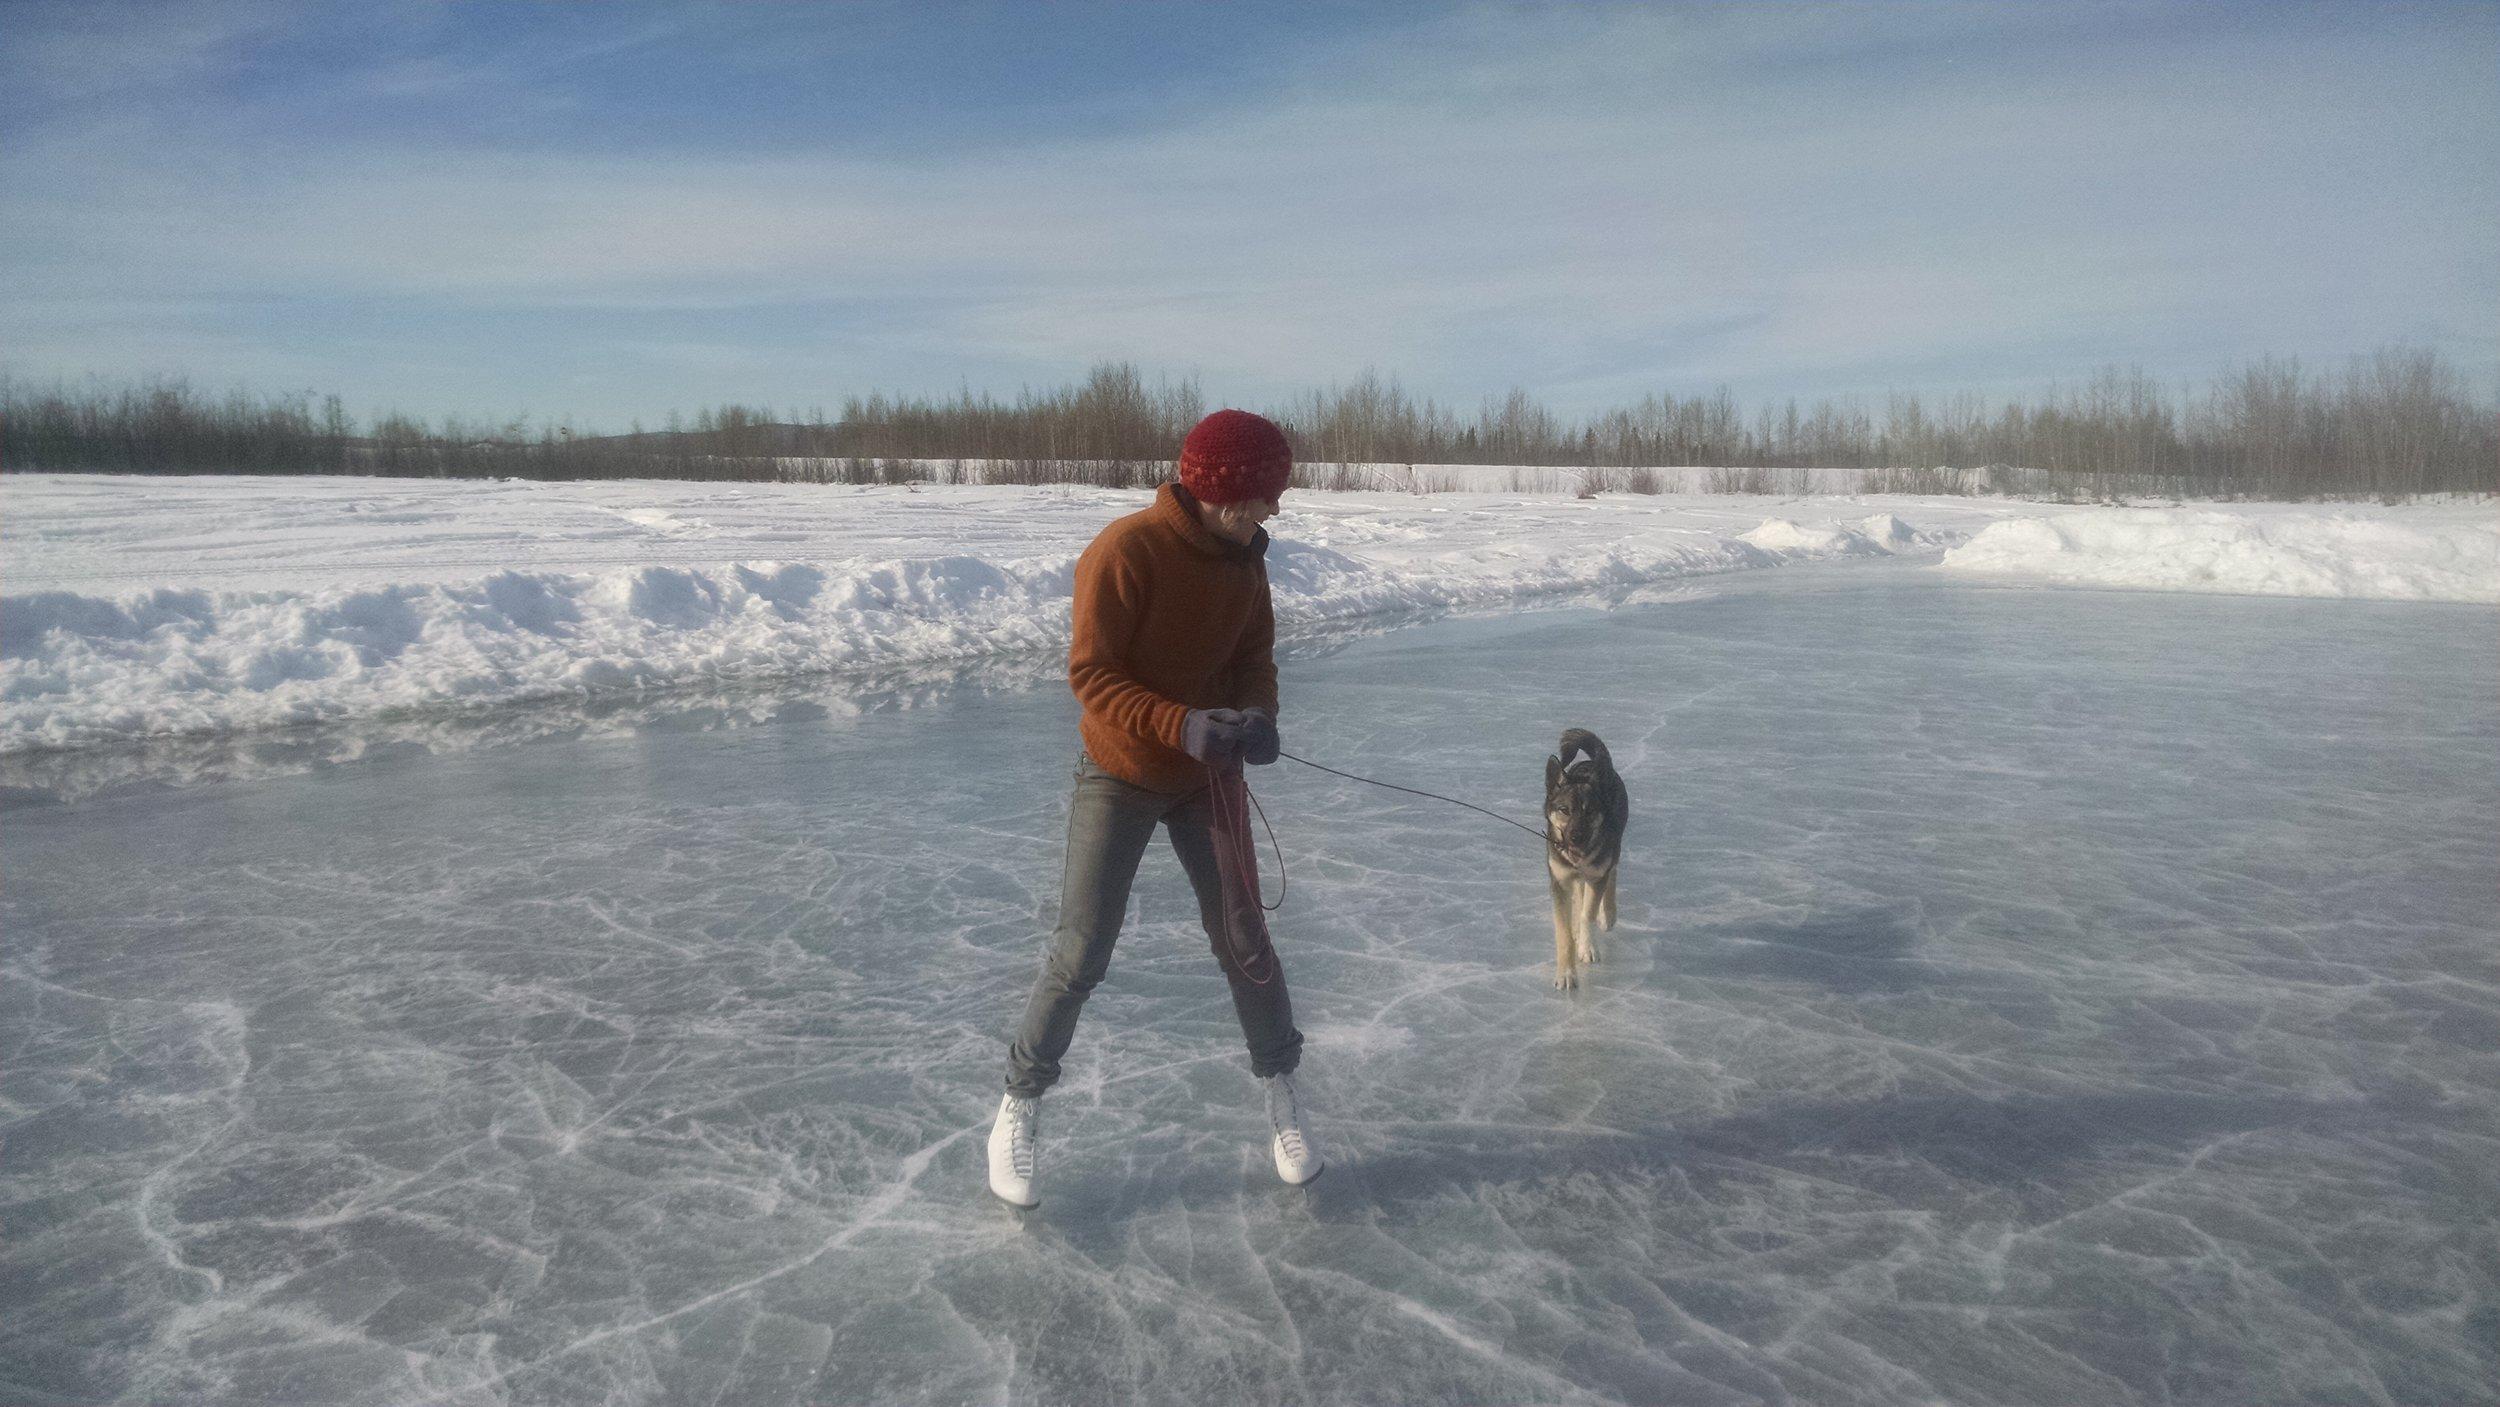 Bruce Lee training at Tanana Lakes ice rink